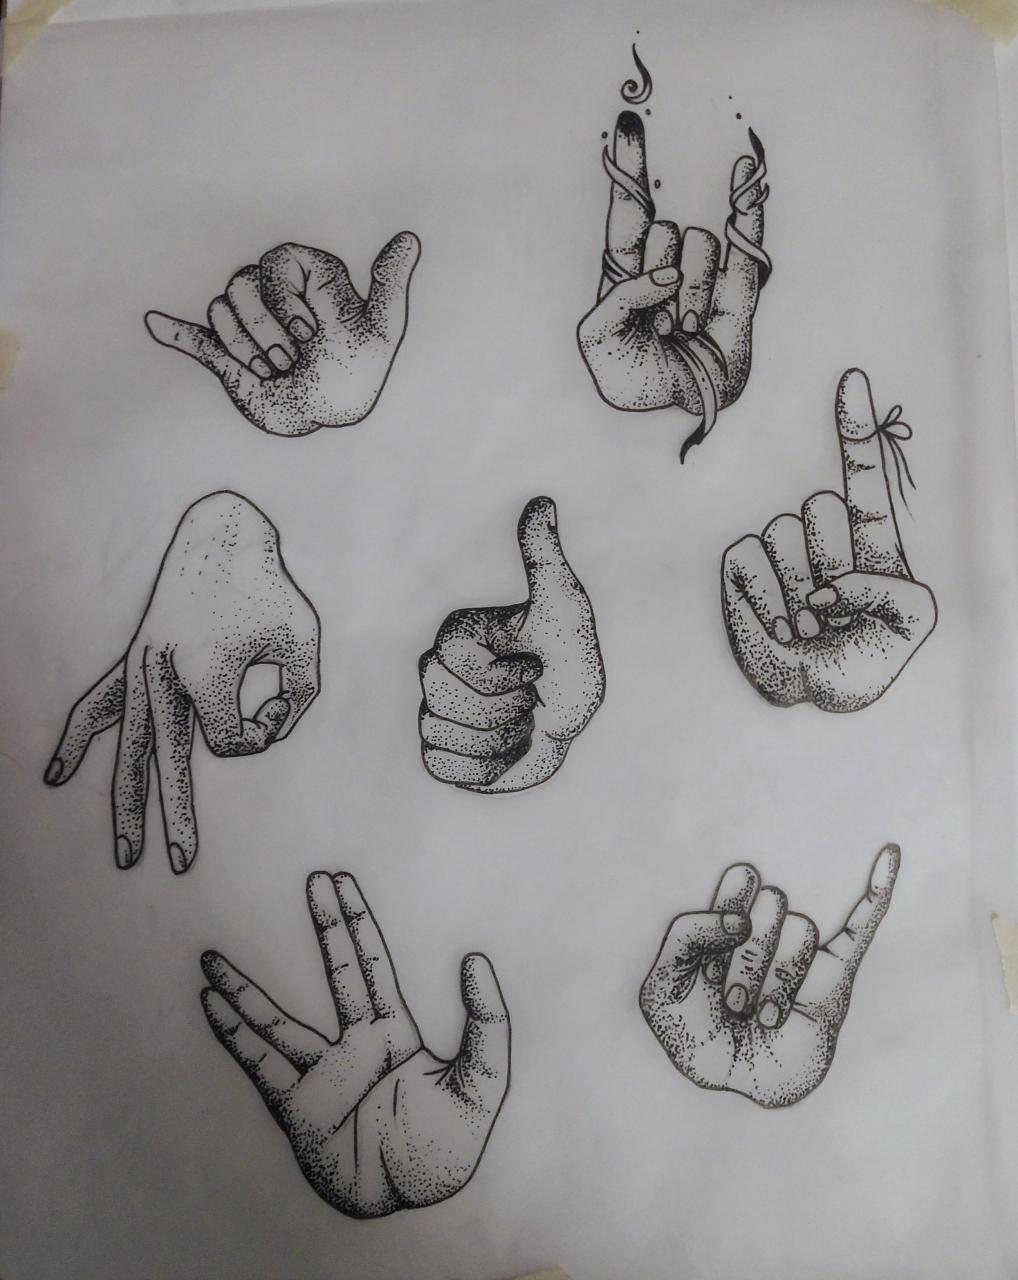 Aspiring Tattoo artist building a portfolio. Any criticism is welcome. Hands 2